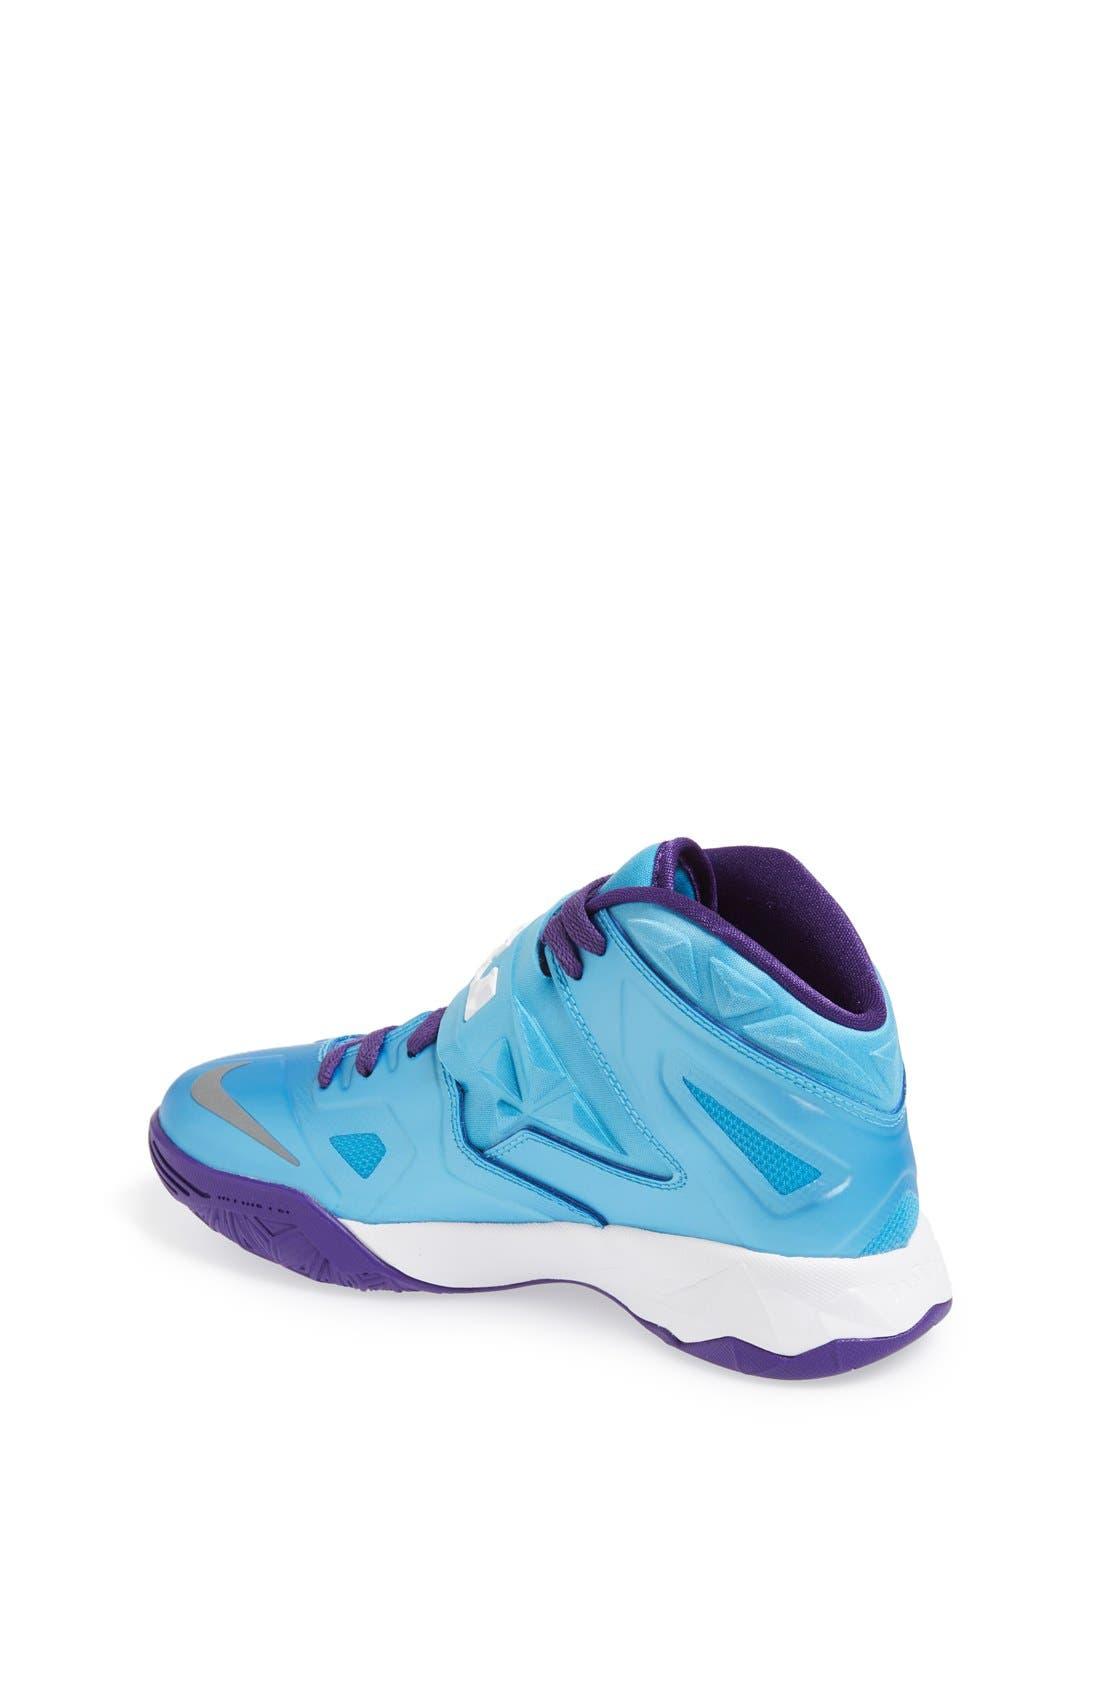 Alternate Image 2  - Nike 'LeBron Zoom Soldier VII' Basketball Shoe (Big Kid)